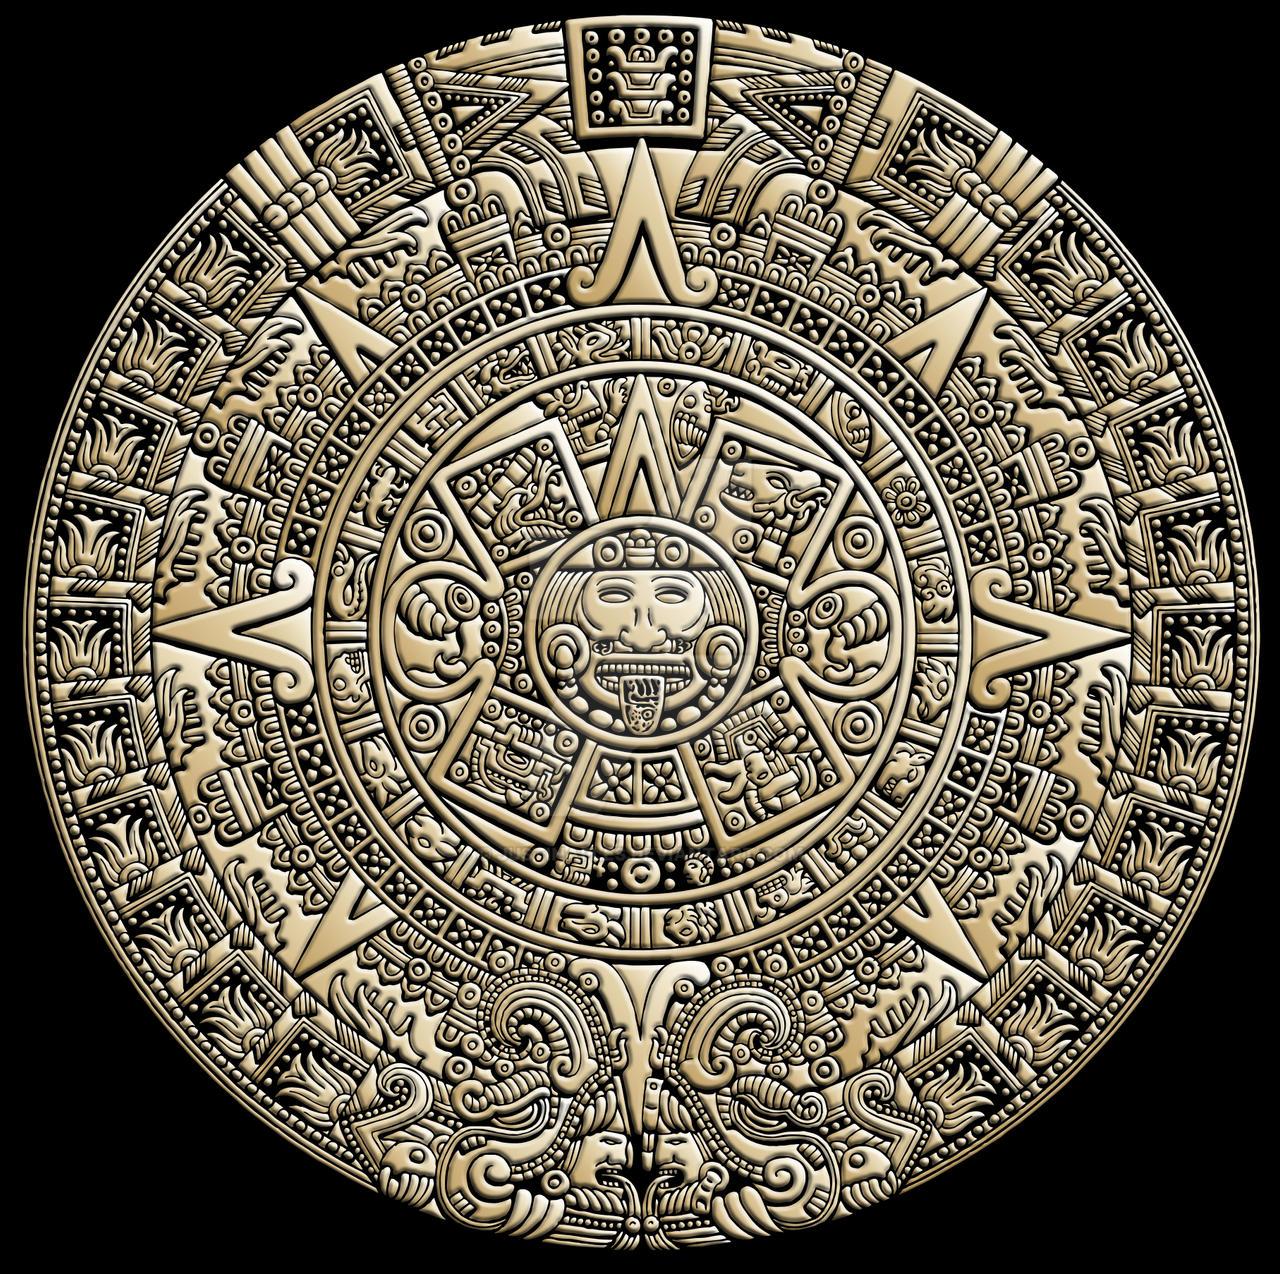 http://img03.deviantart.net/894f/i/2015/123/c/a/aztec_calendar_by_justinaples-d29crod.jpg